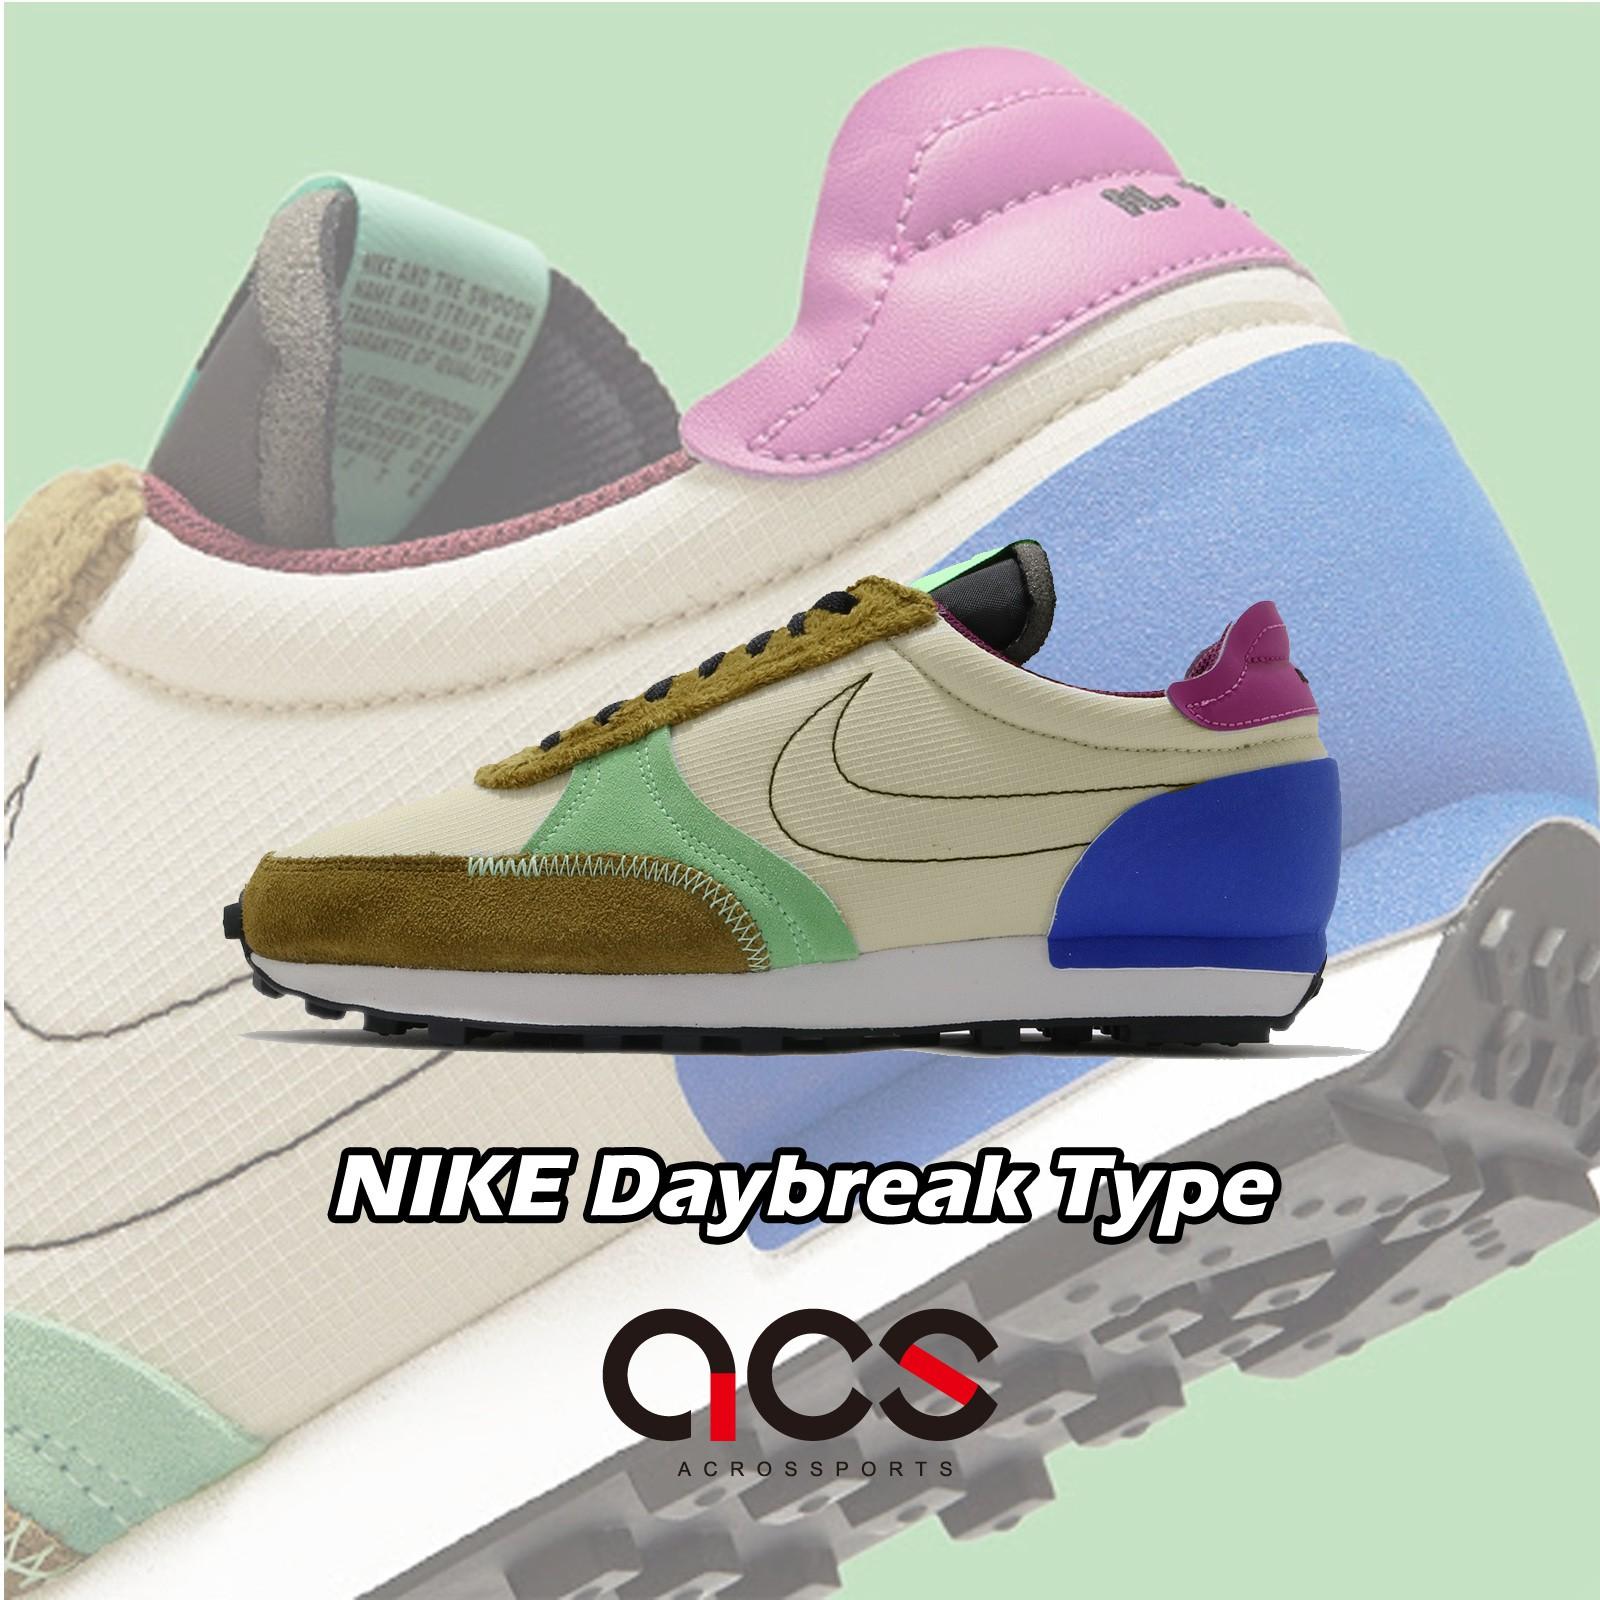 Nike 休閒鞋 DBreak-Type 米白 綠 紫 藍 麂皮 毛料 男鞋 異材質拼接【ACS】 DC3274-203